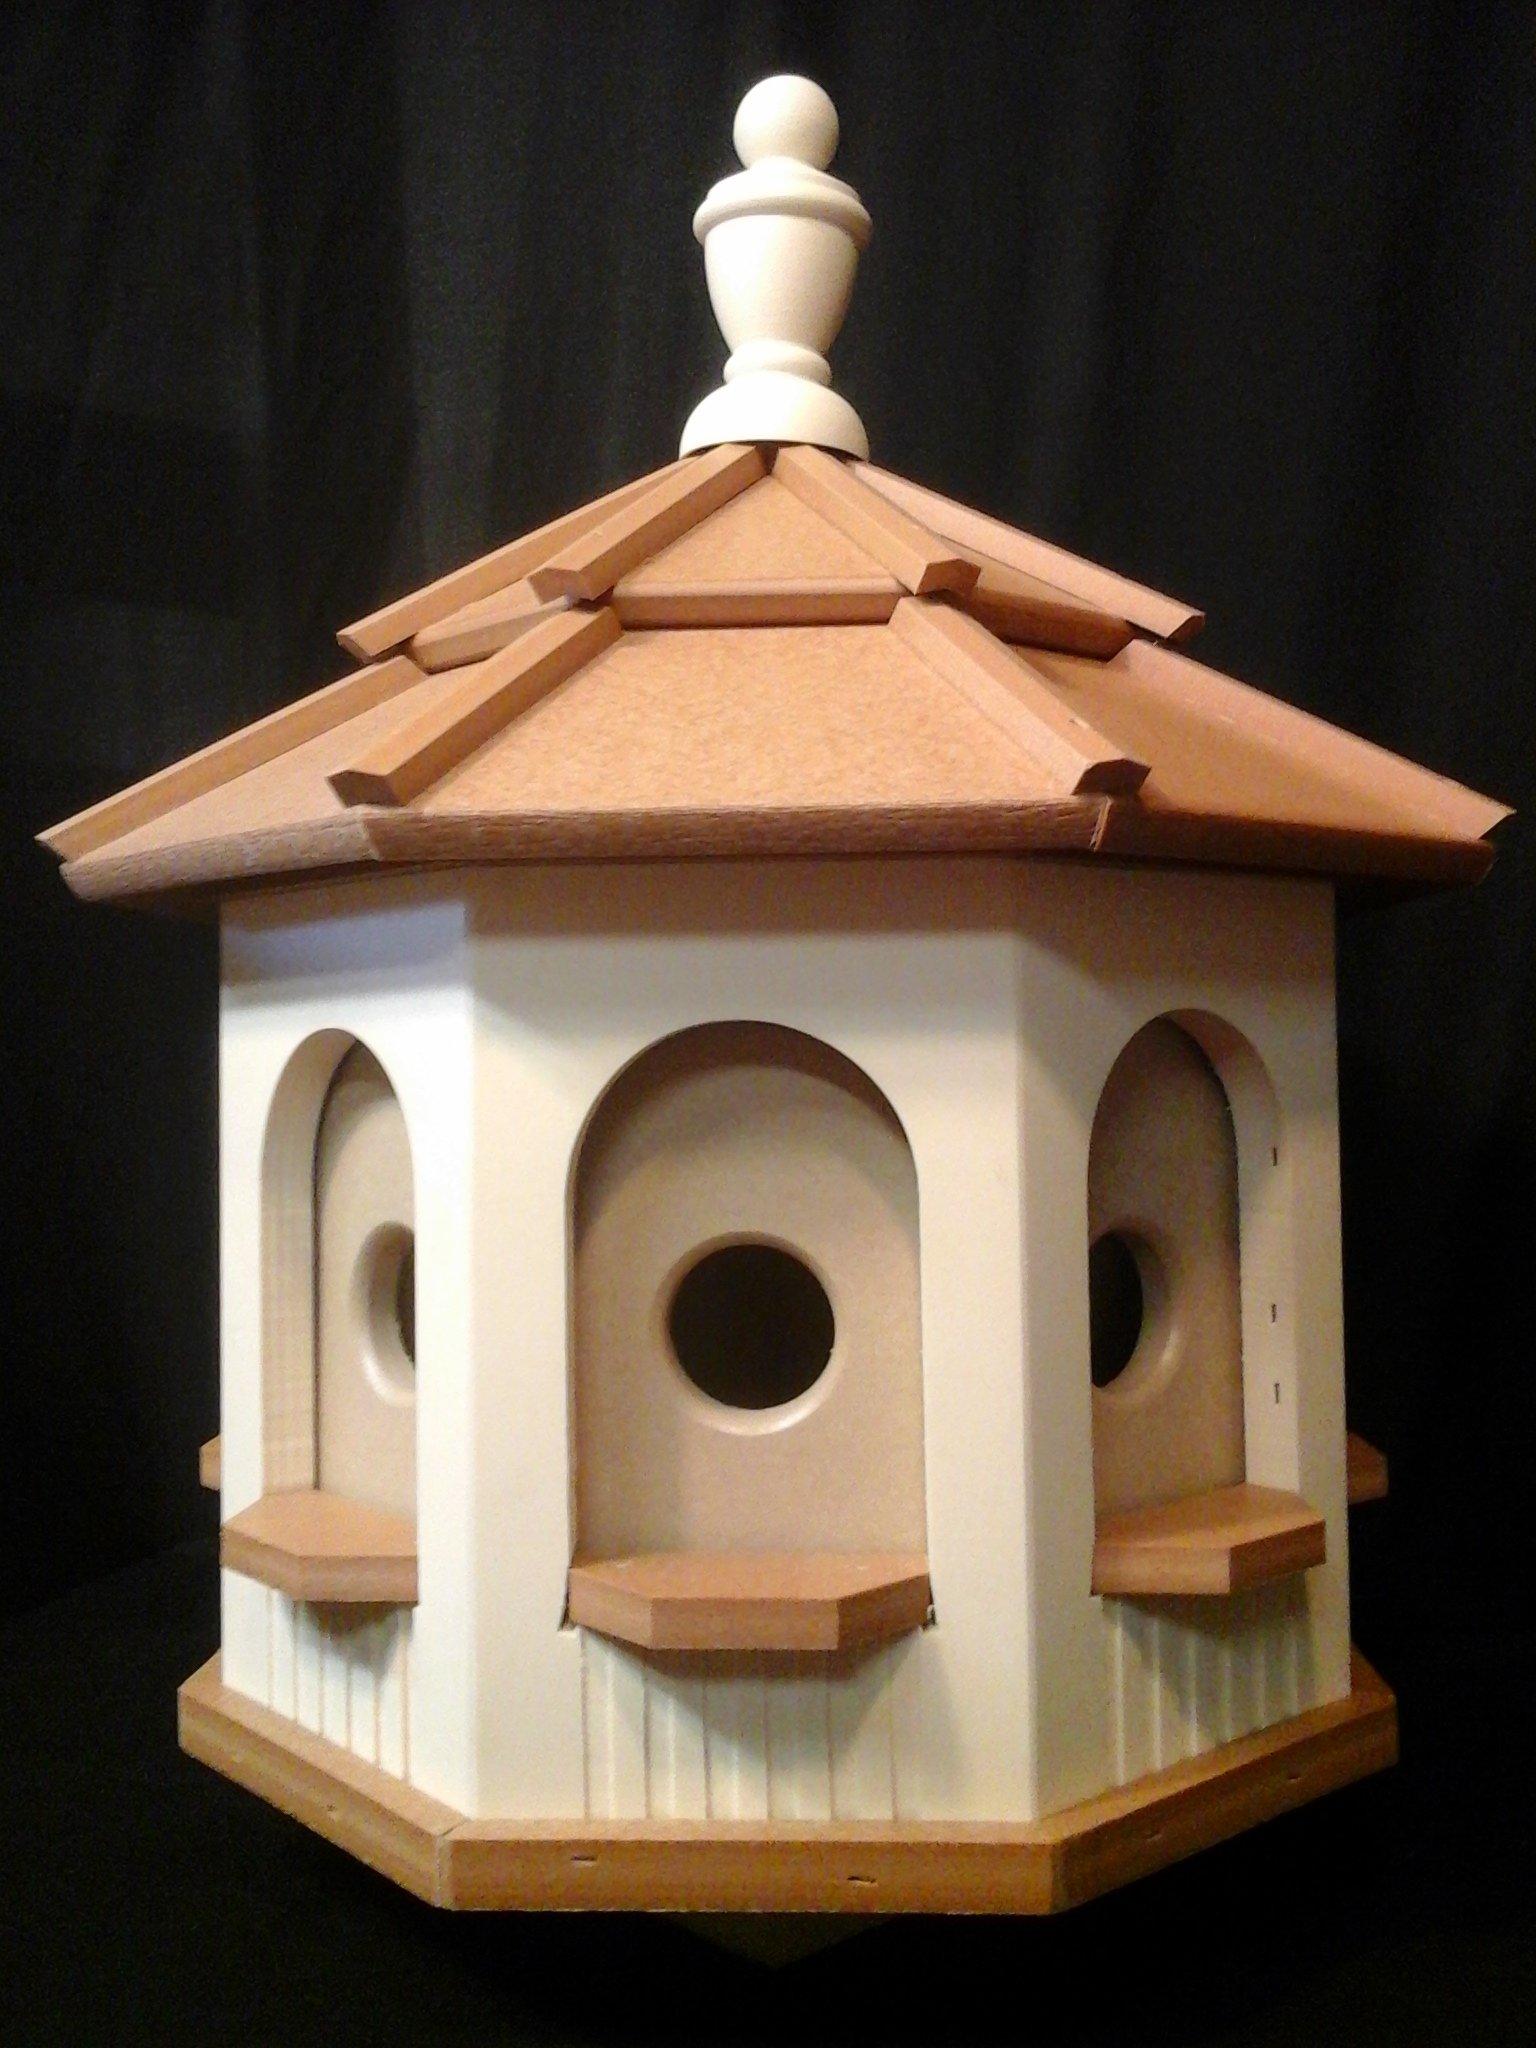 Handcrafted Poly Gazebo Birdhouse Homemade Handmade Ivory & Cedar